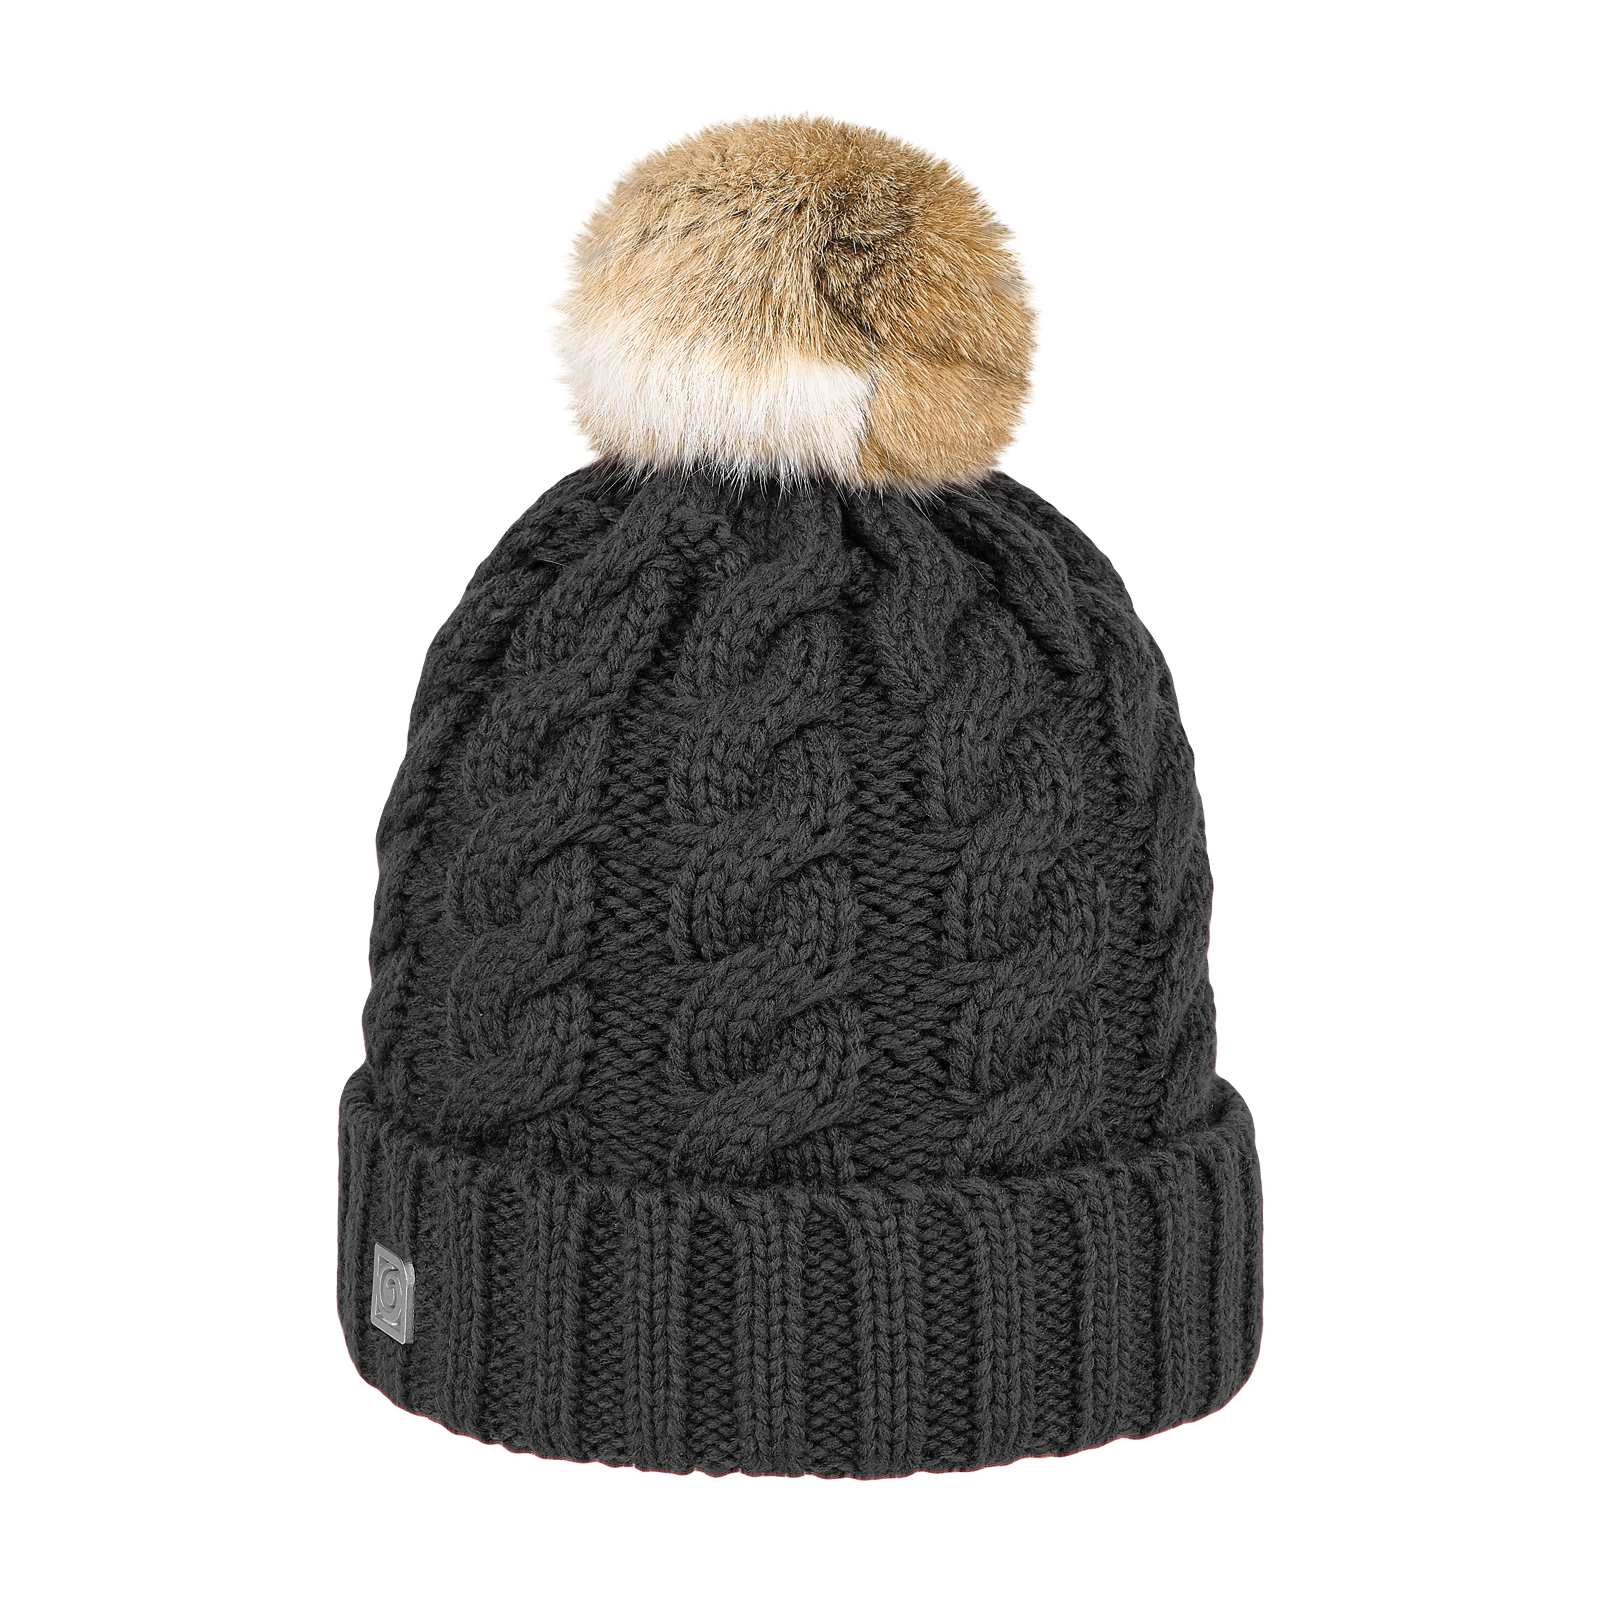 e0506a75195 Black Rabbit Pom Pom Hat - fur pom pom hat